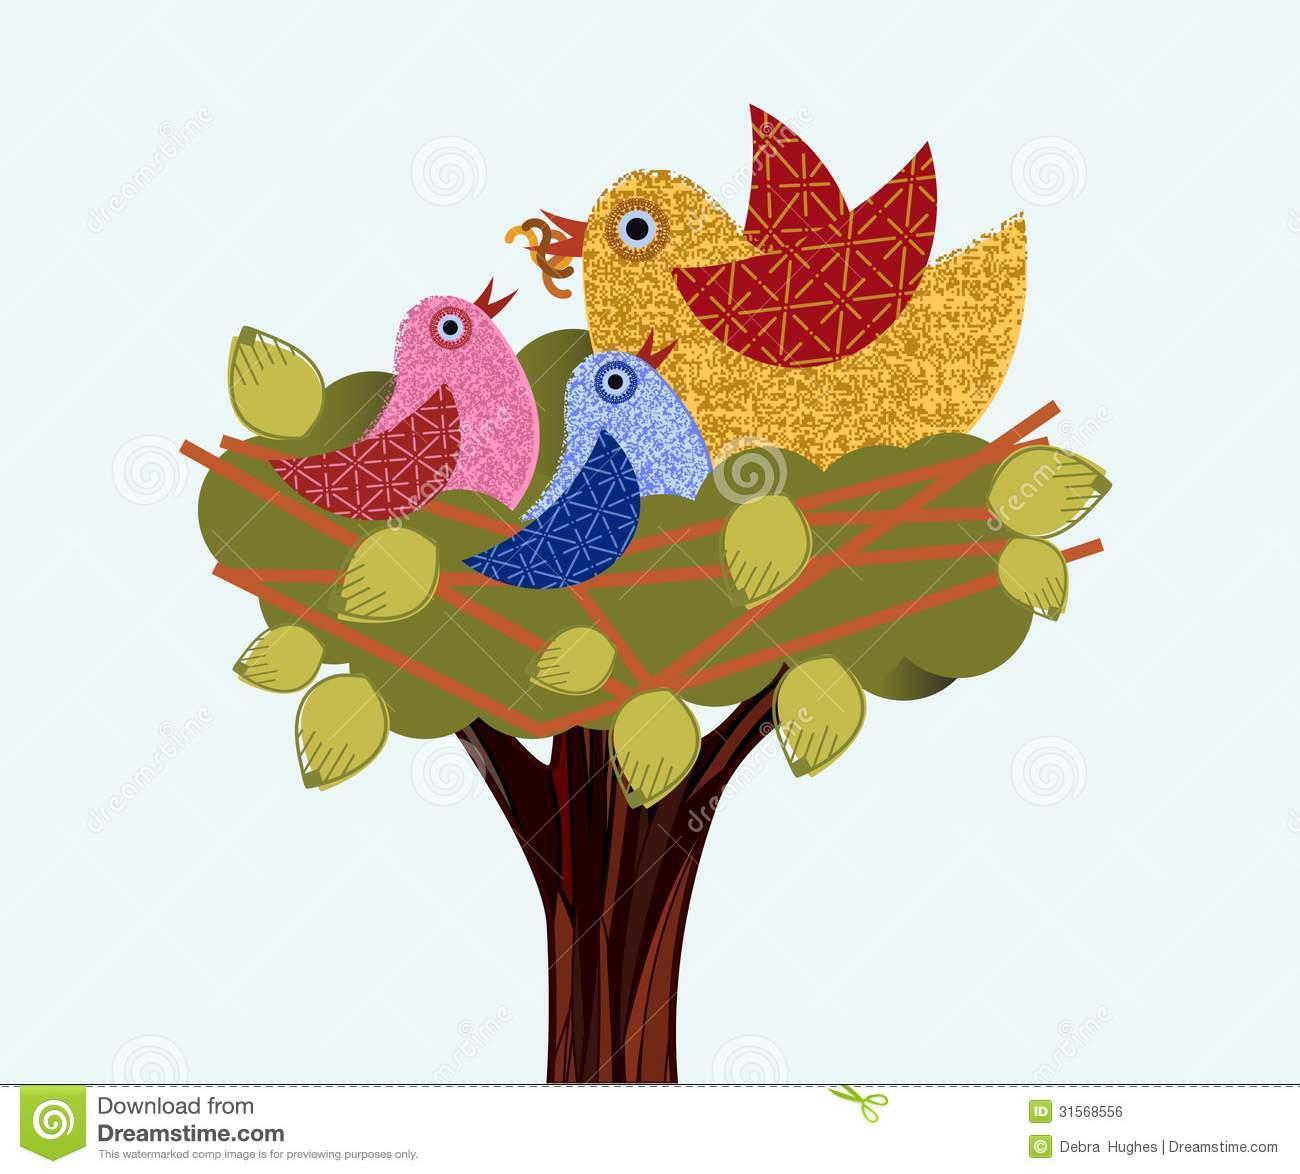 Sweet Birds Tree Mother Father Bird Feeding Babies Nest 31568556 Jpg